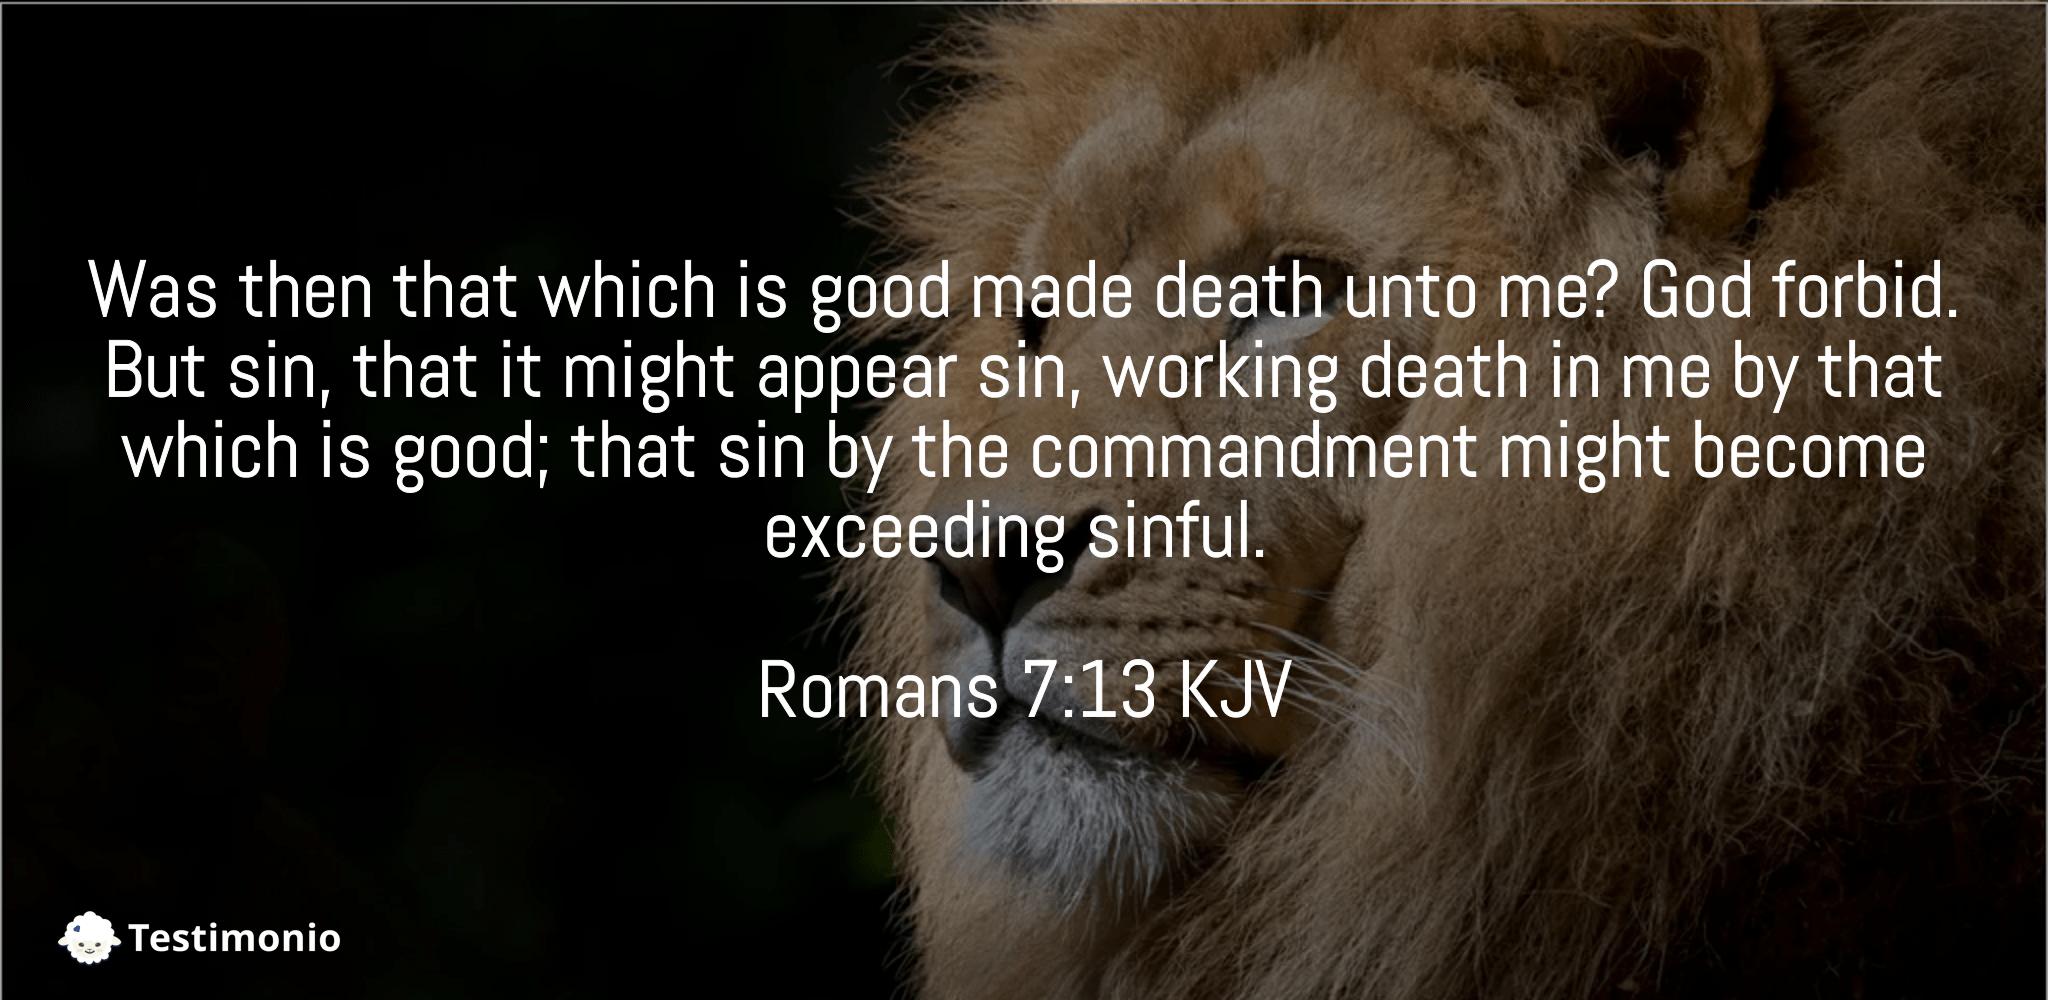 Romans 7:13